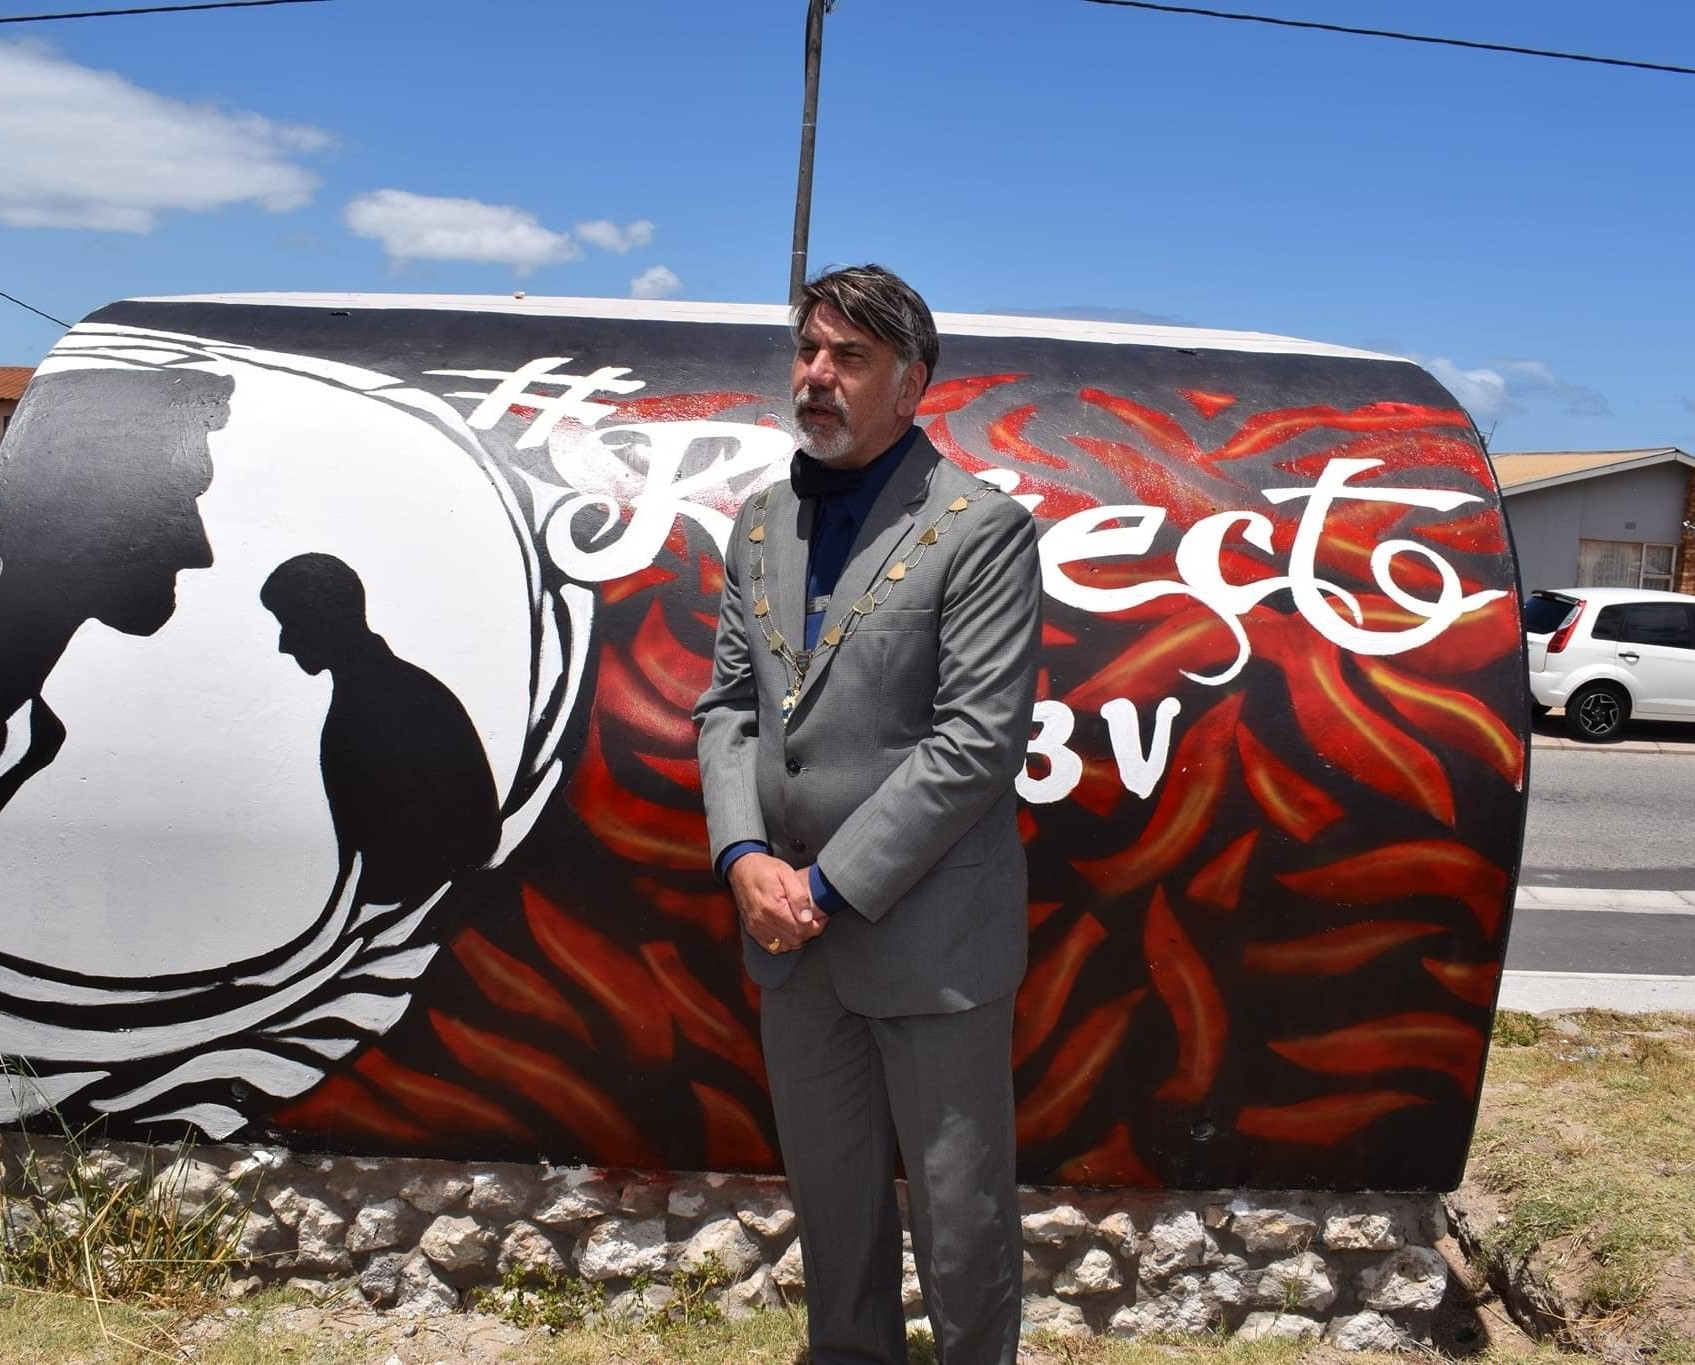 25-11-20 Executive Mayor Koen GBV mural